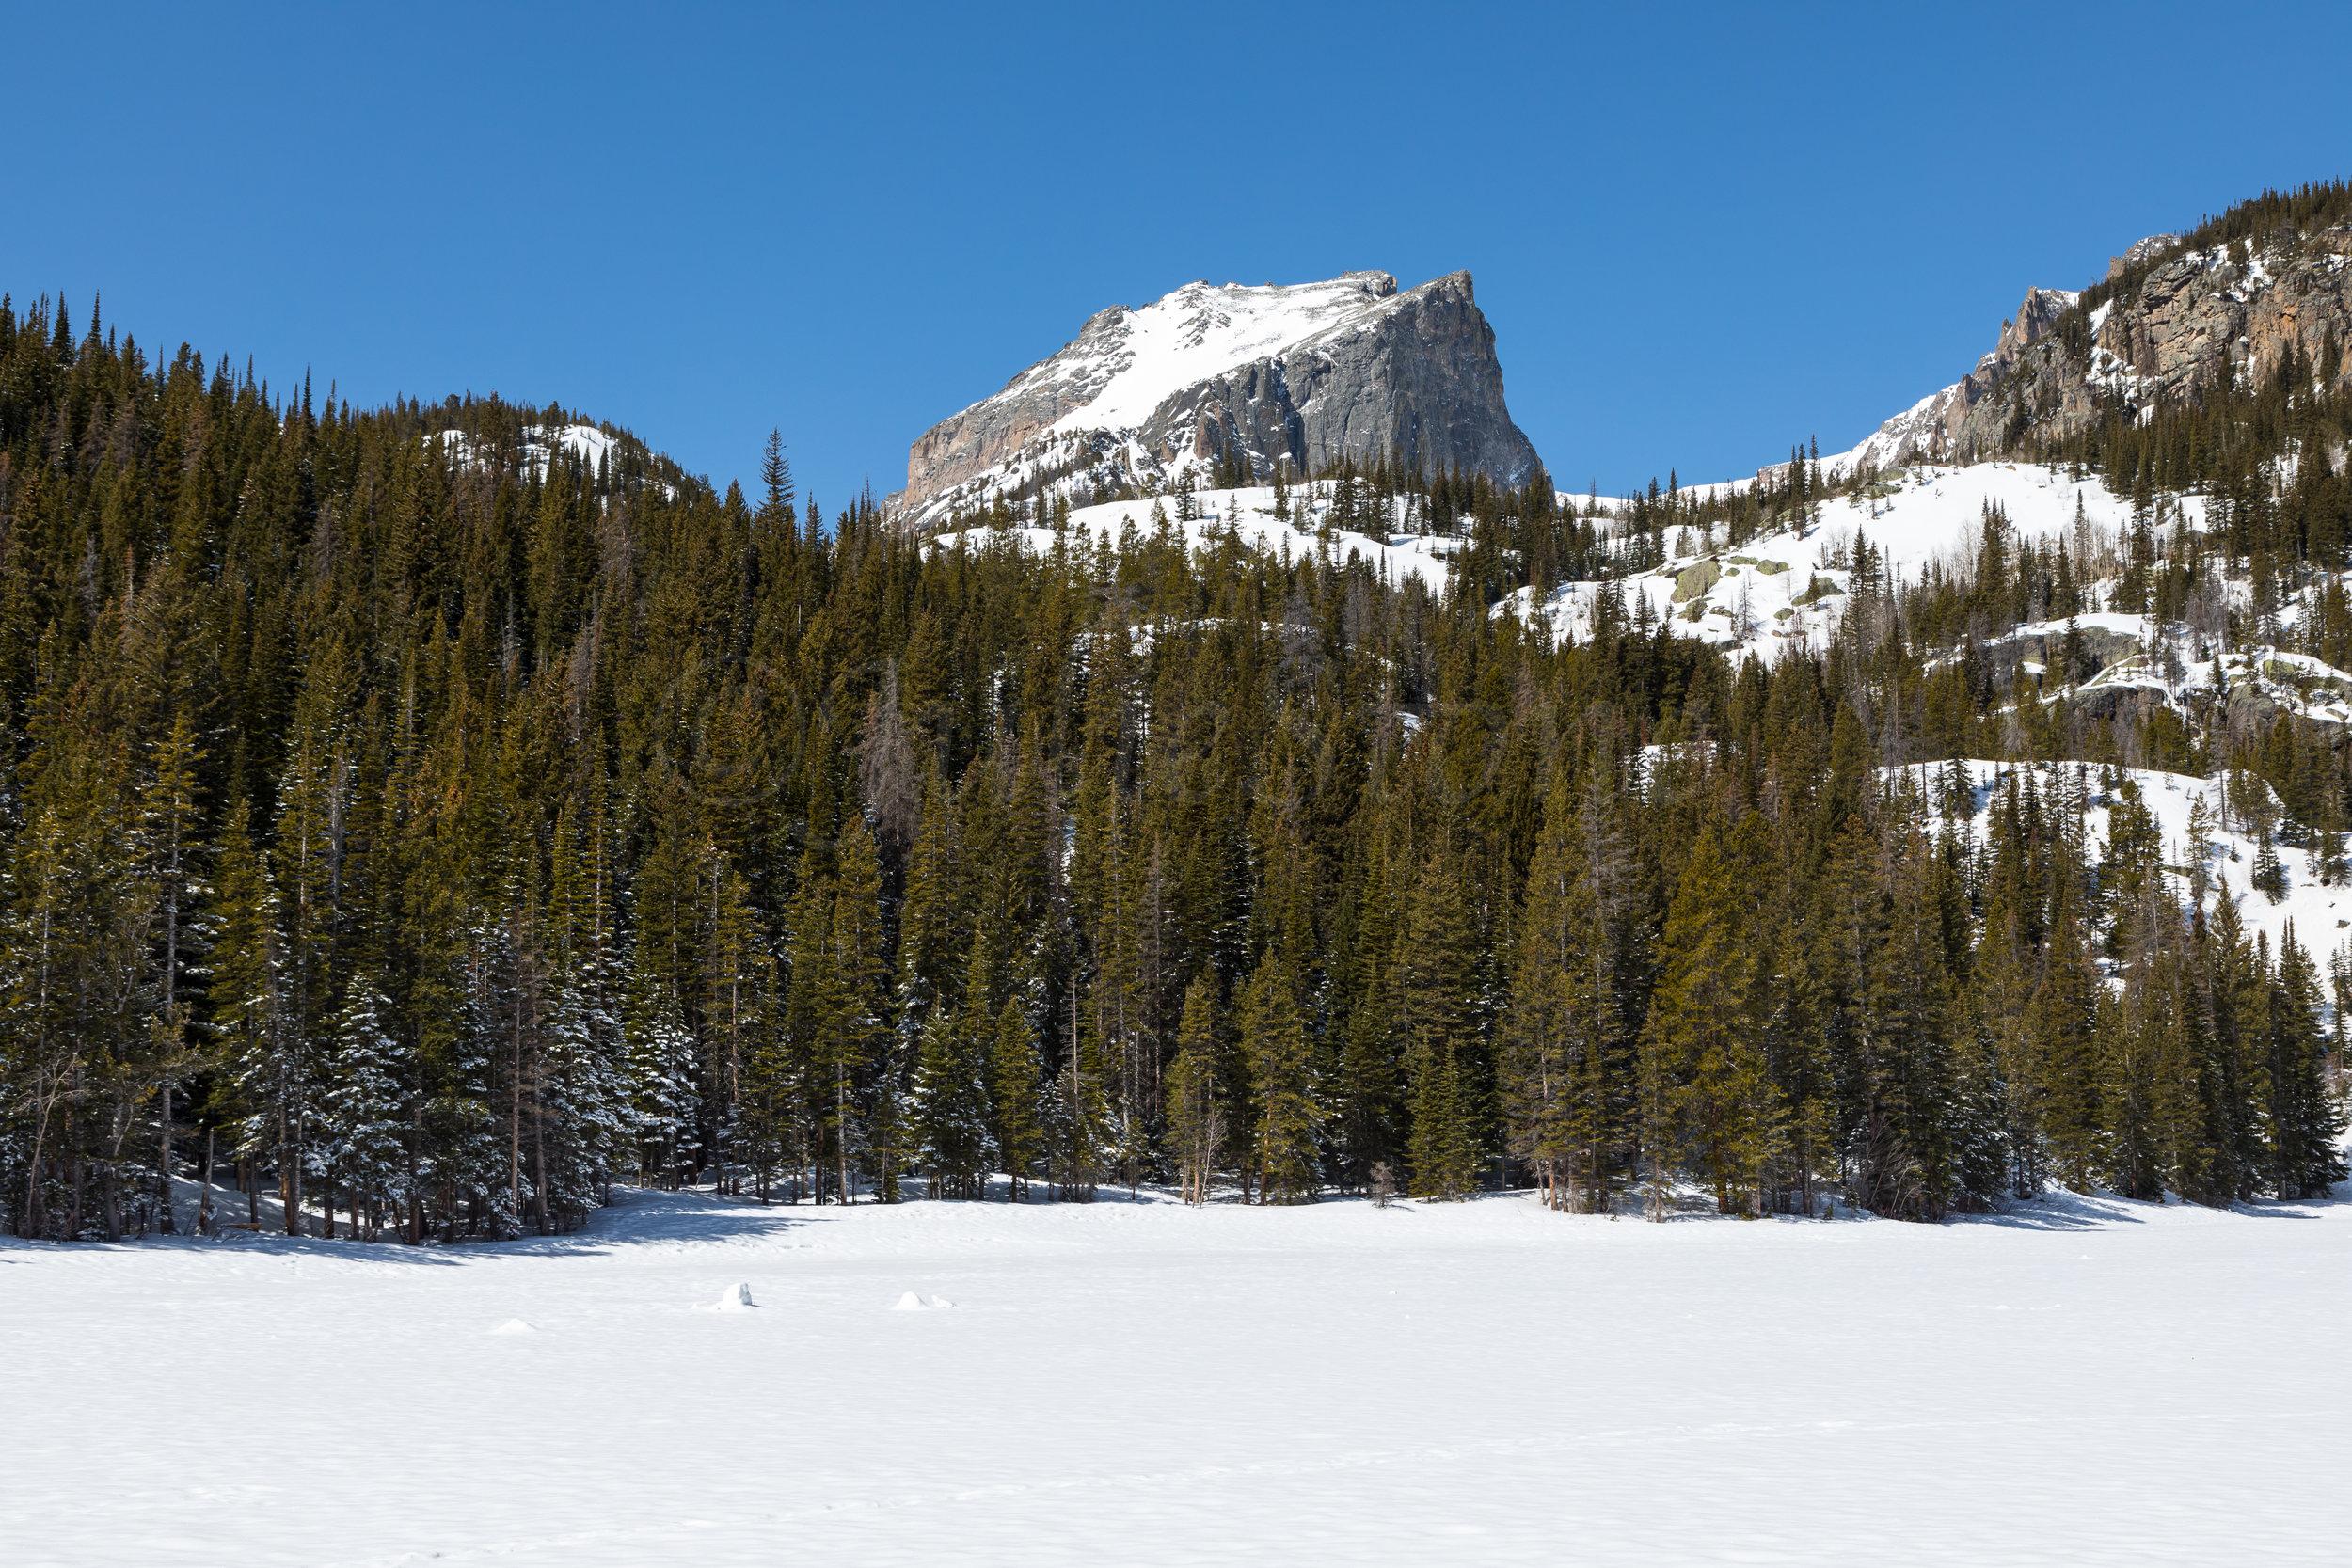 Rocky Mountain National Park, Image # 5401